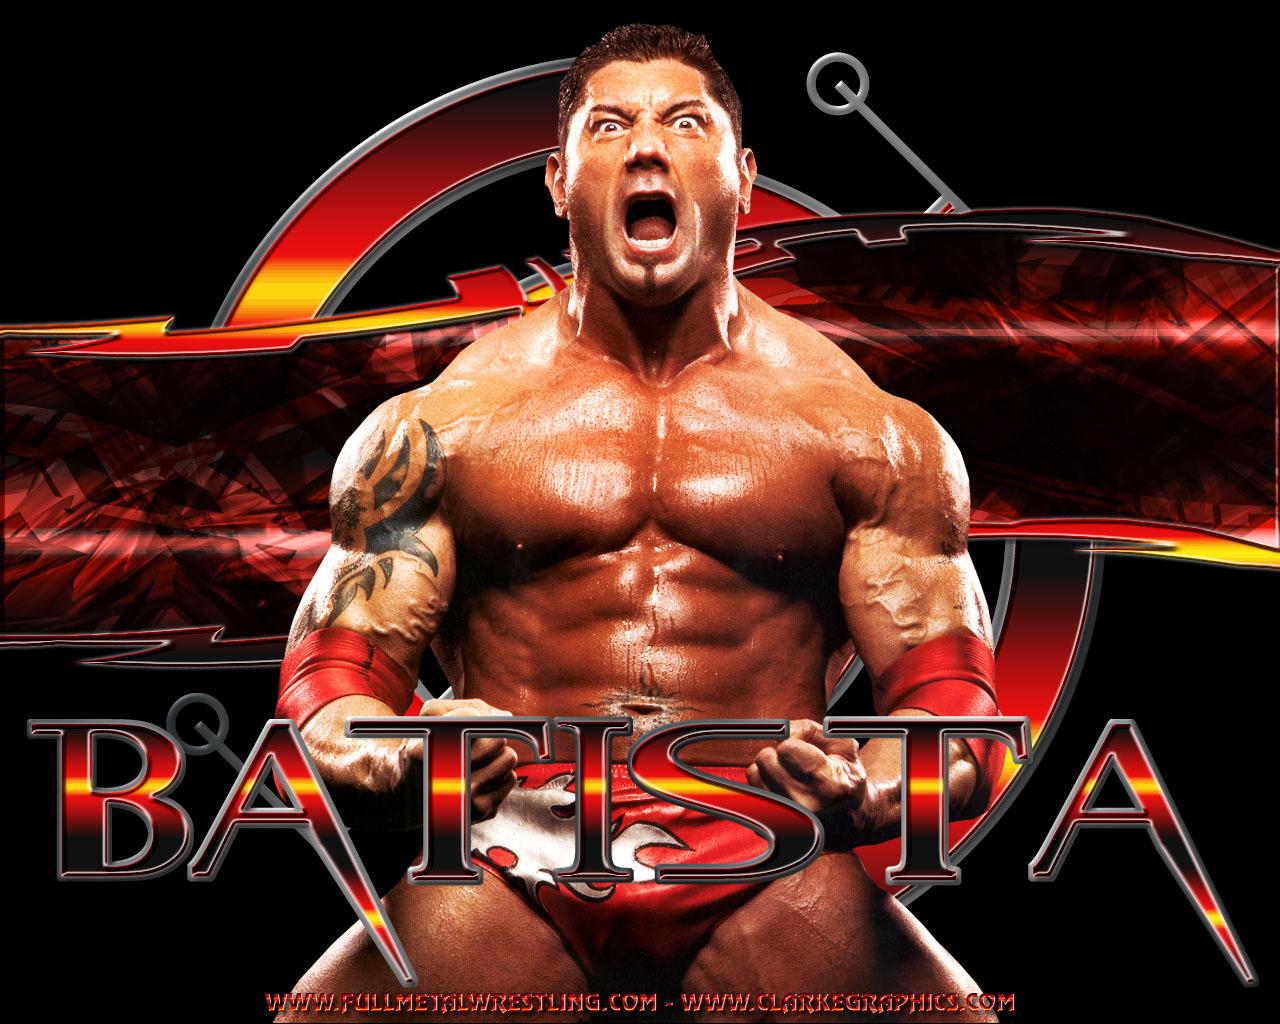 http://3.bp.blogspot.com/--d8WpqpcXOc/TkQV9ZVBgoI/AAAAAAAAHYU/YYFLIFsTPEg/s1600/Batista-%202.jpg